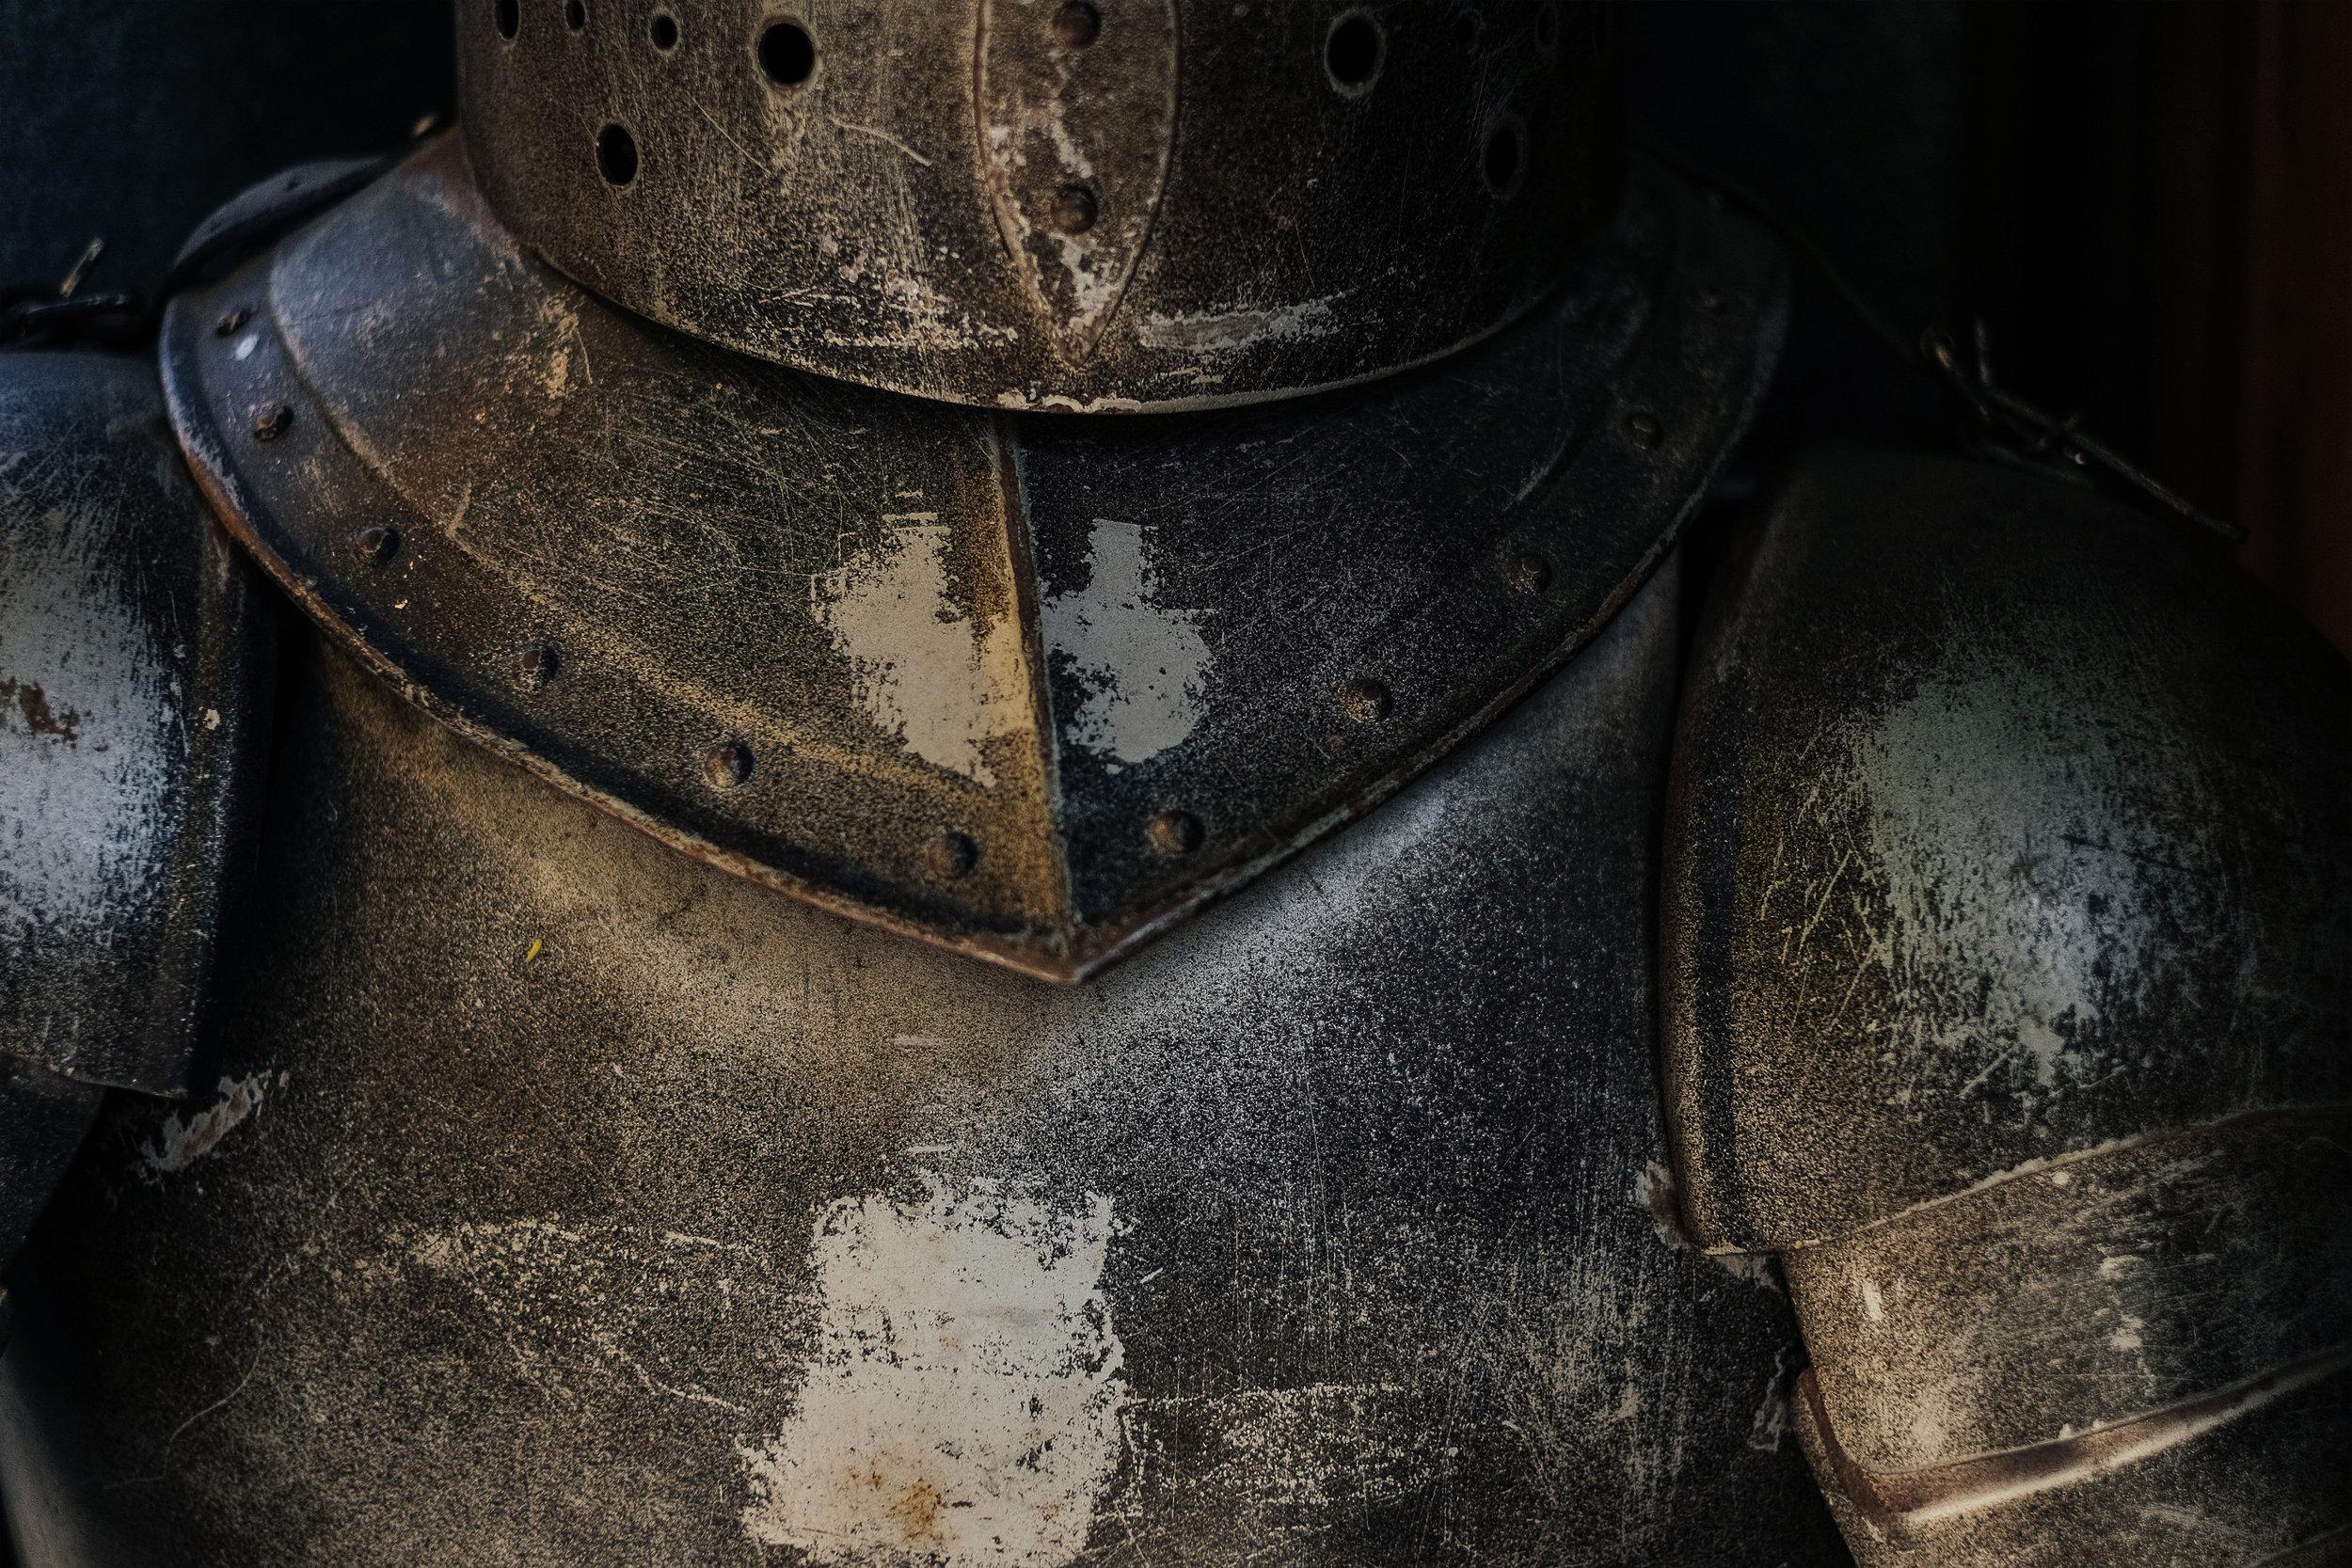 knight-armor-P6QZ3JP.jpg